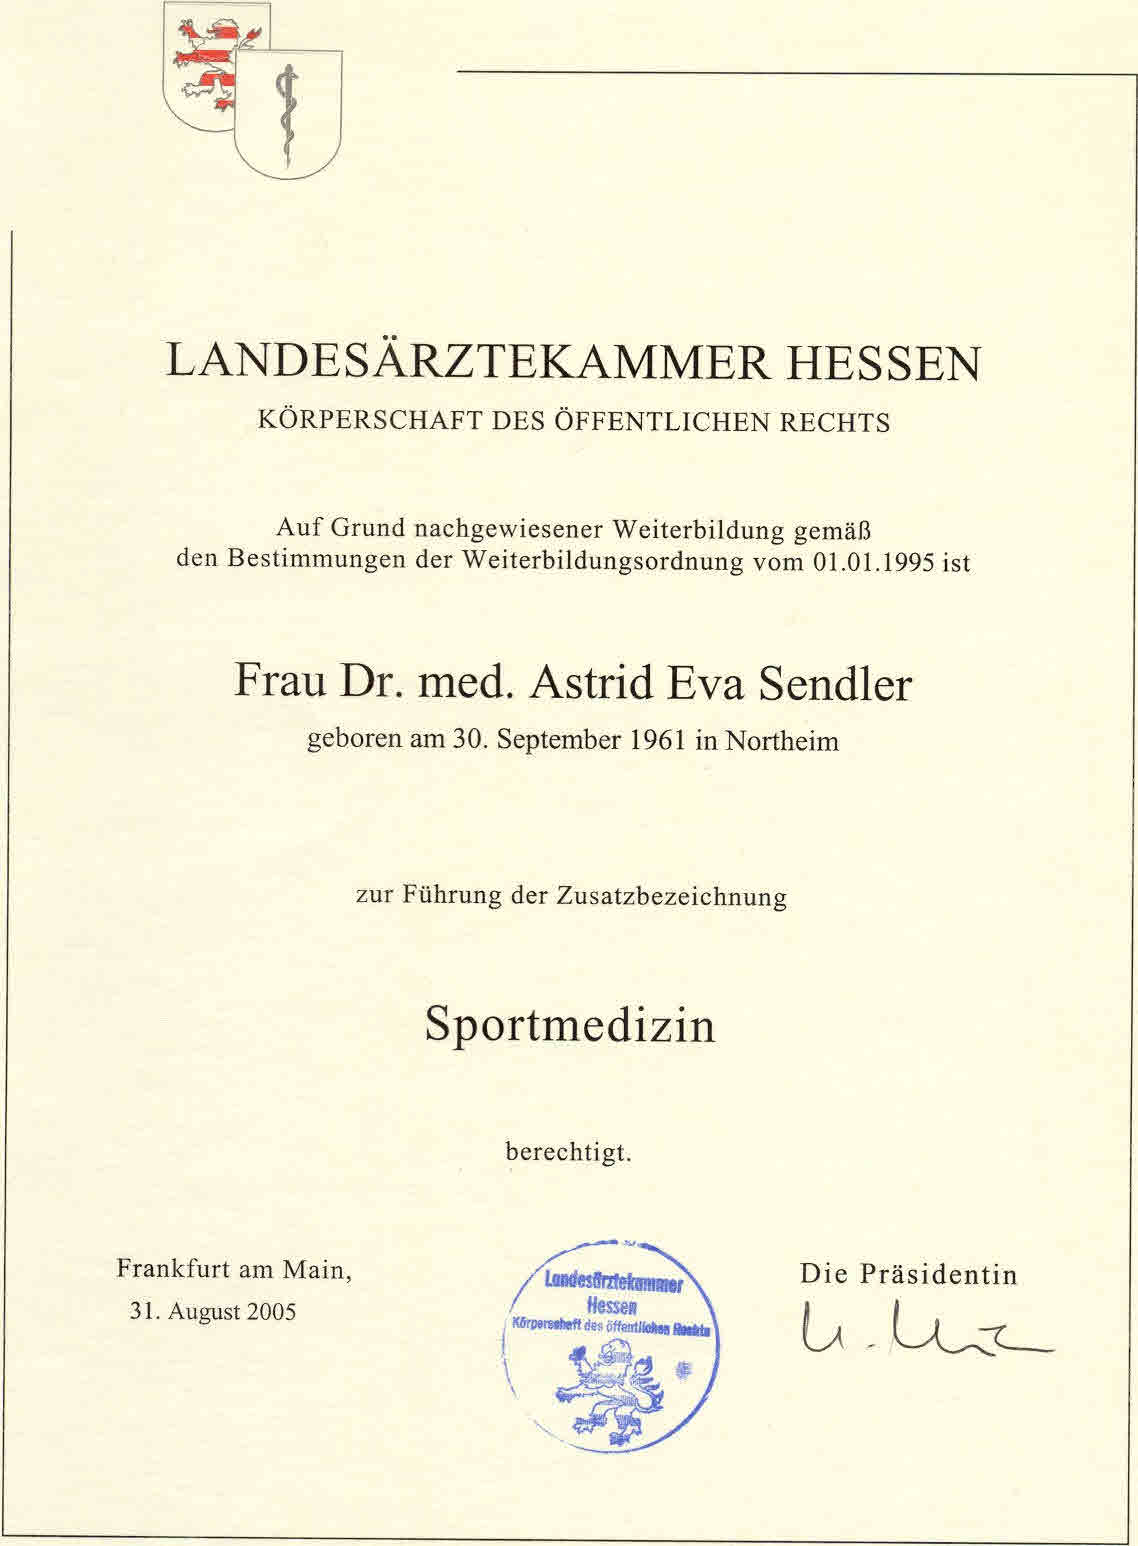 Anerkennung Sportarzt 22 09 05 Orig